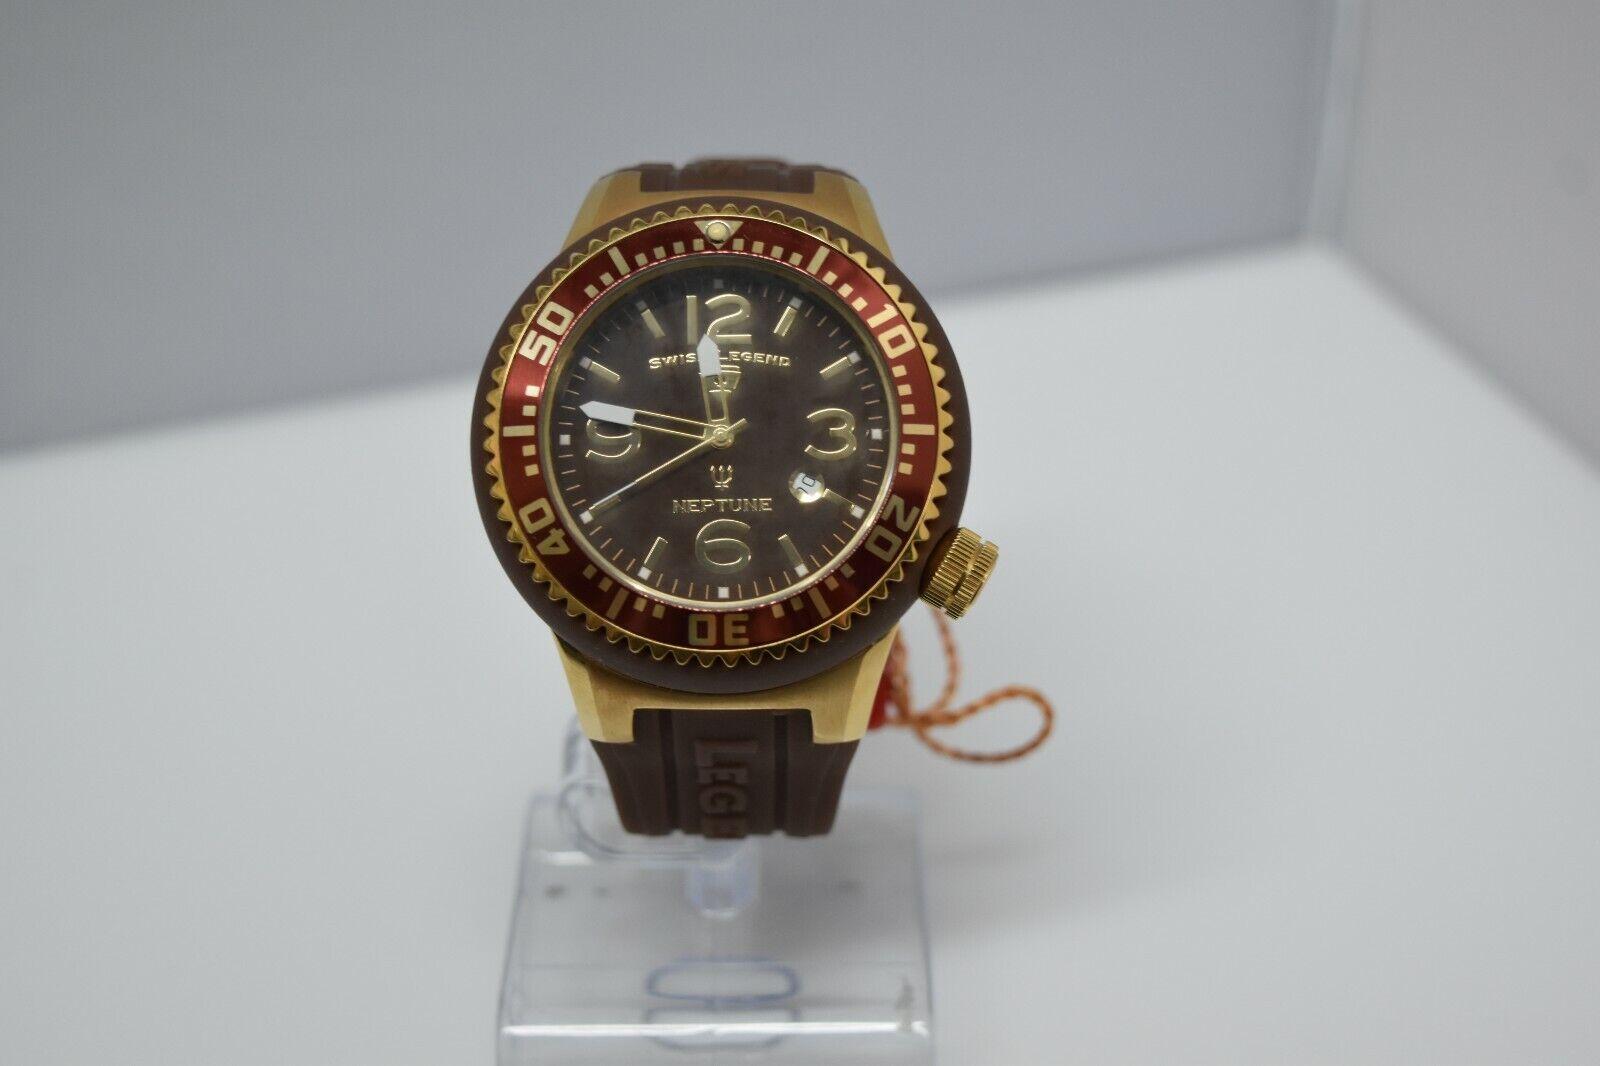 Swiss Legend Neptune Swiss Oversized 52mm Watch Brown/YG/Brown